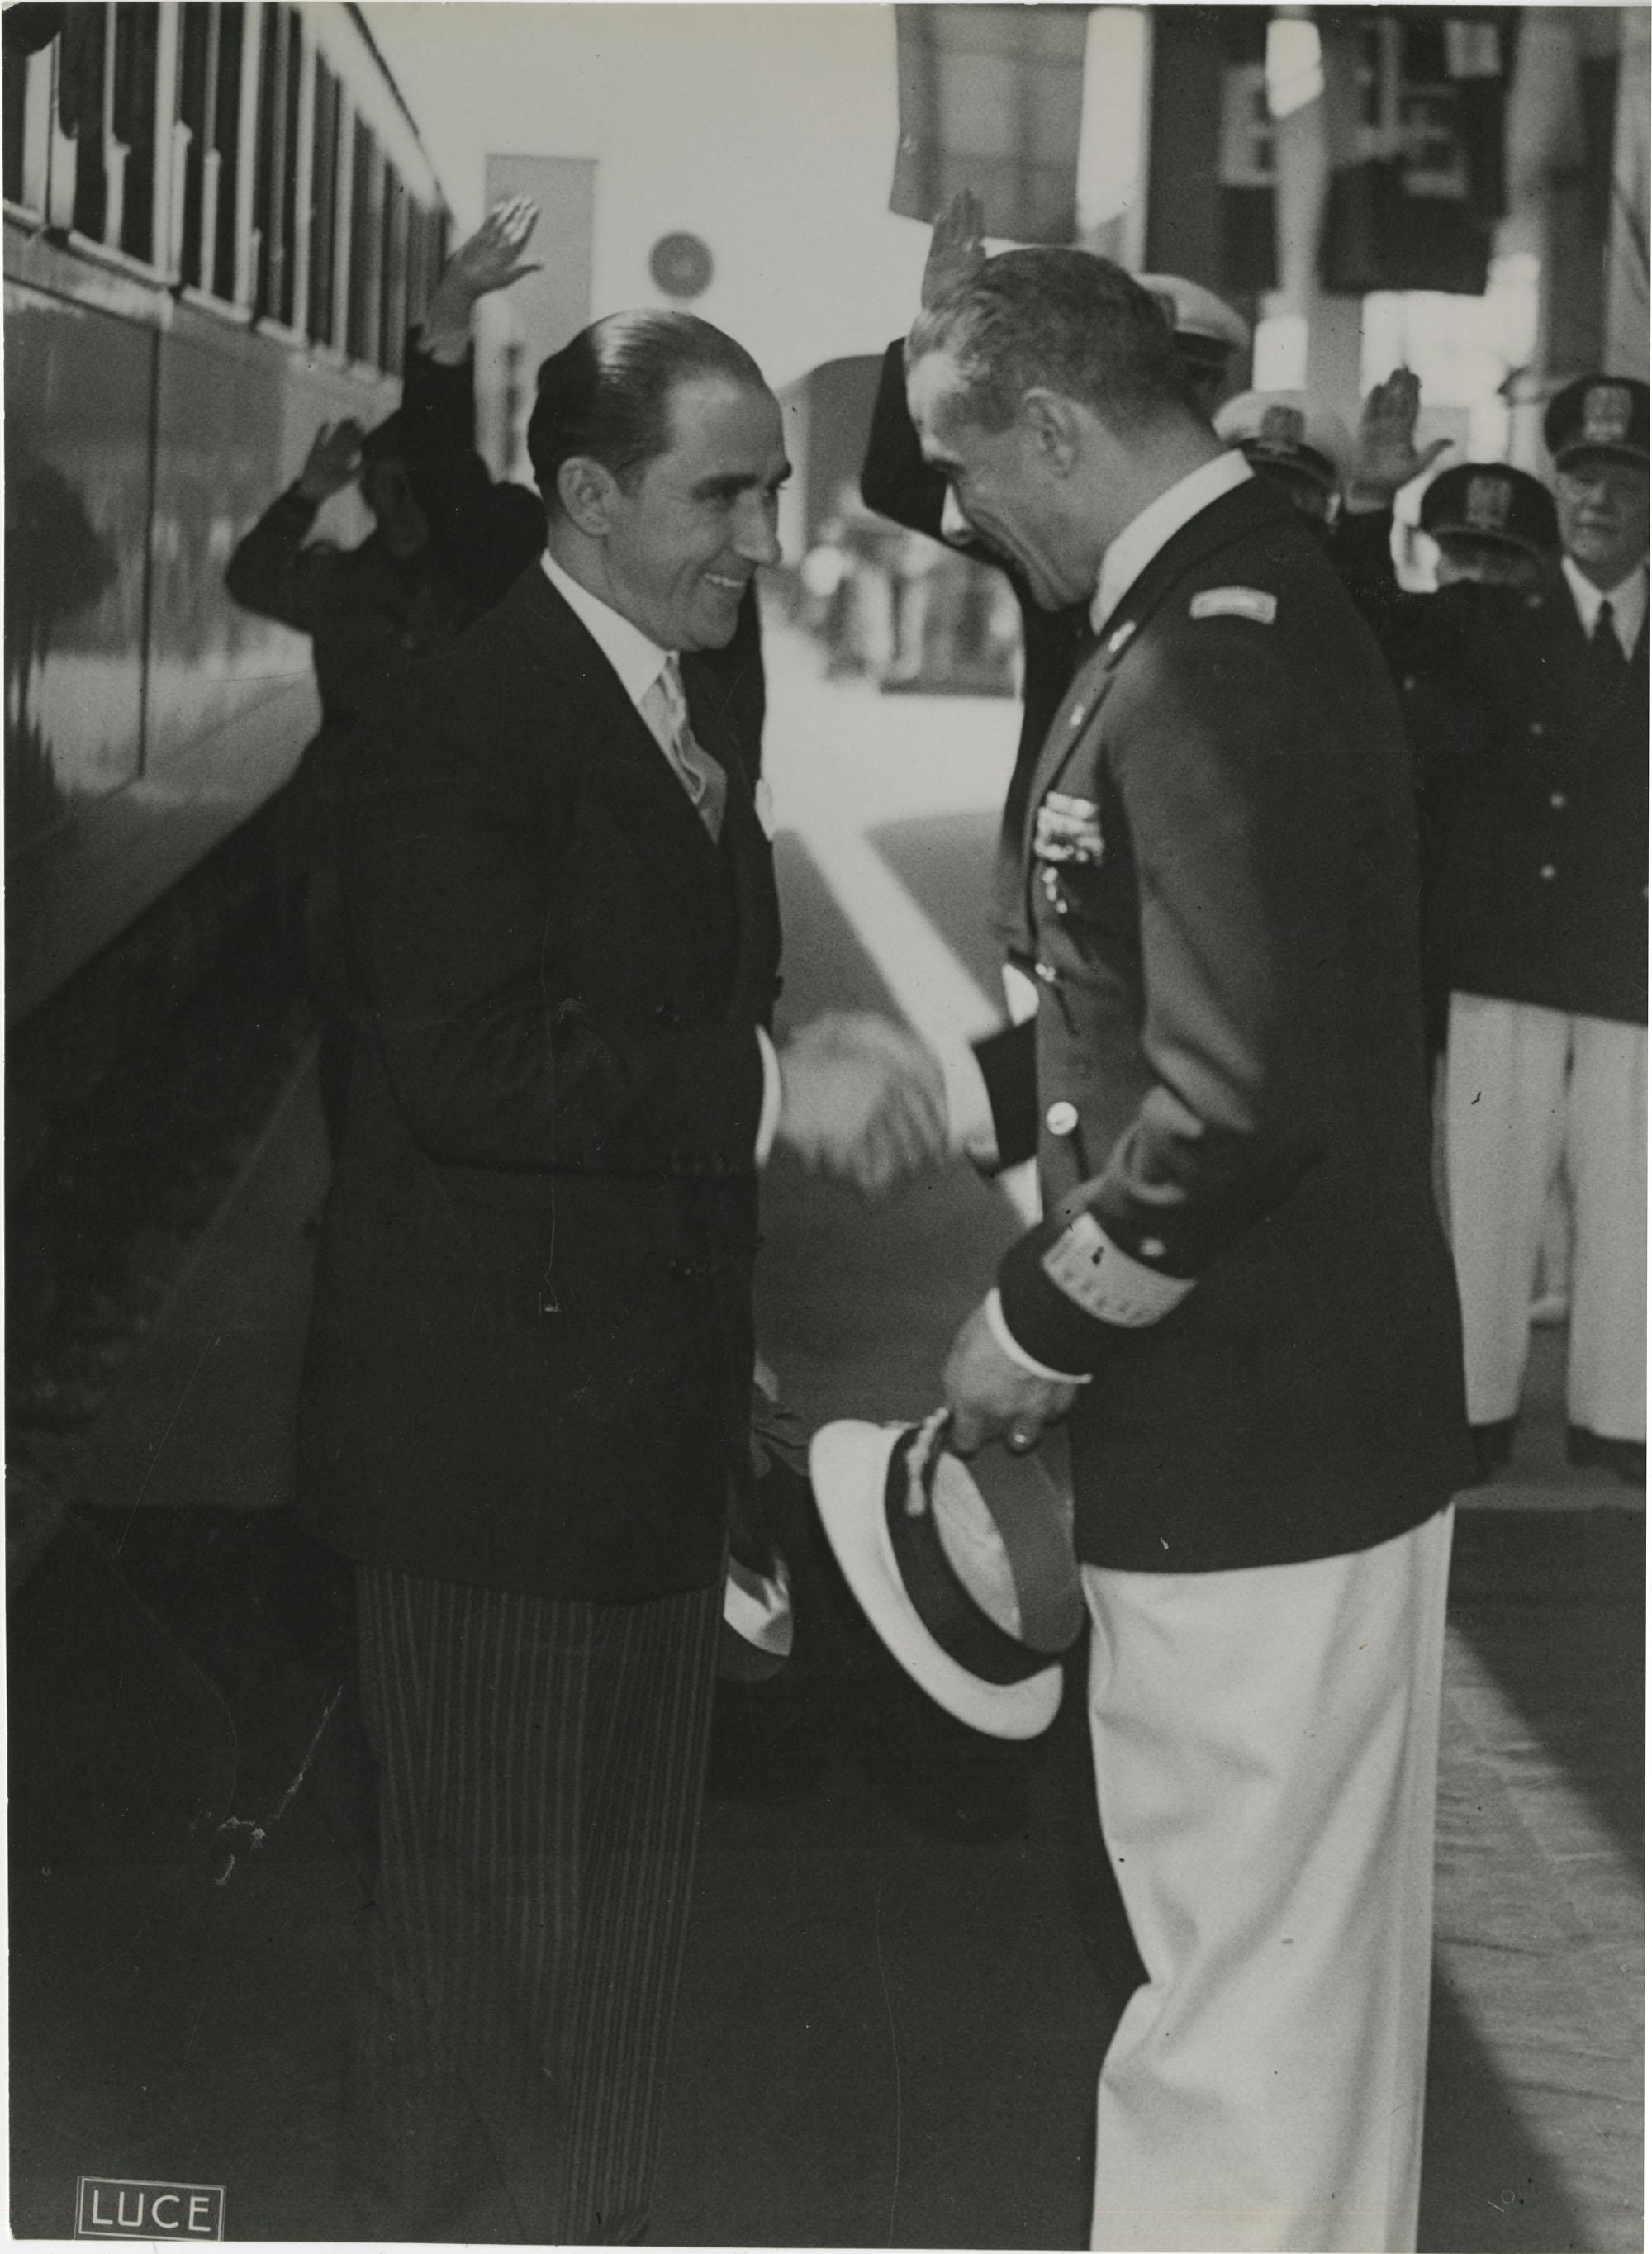 Mihai Antonescu's visit to Benito Mussolini, Photograph 61